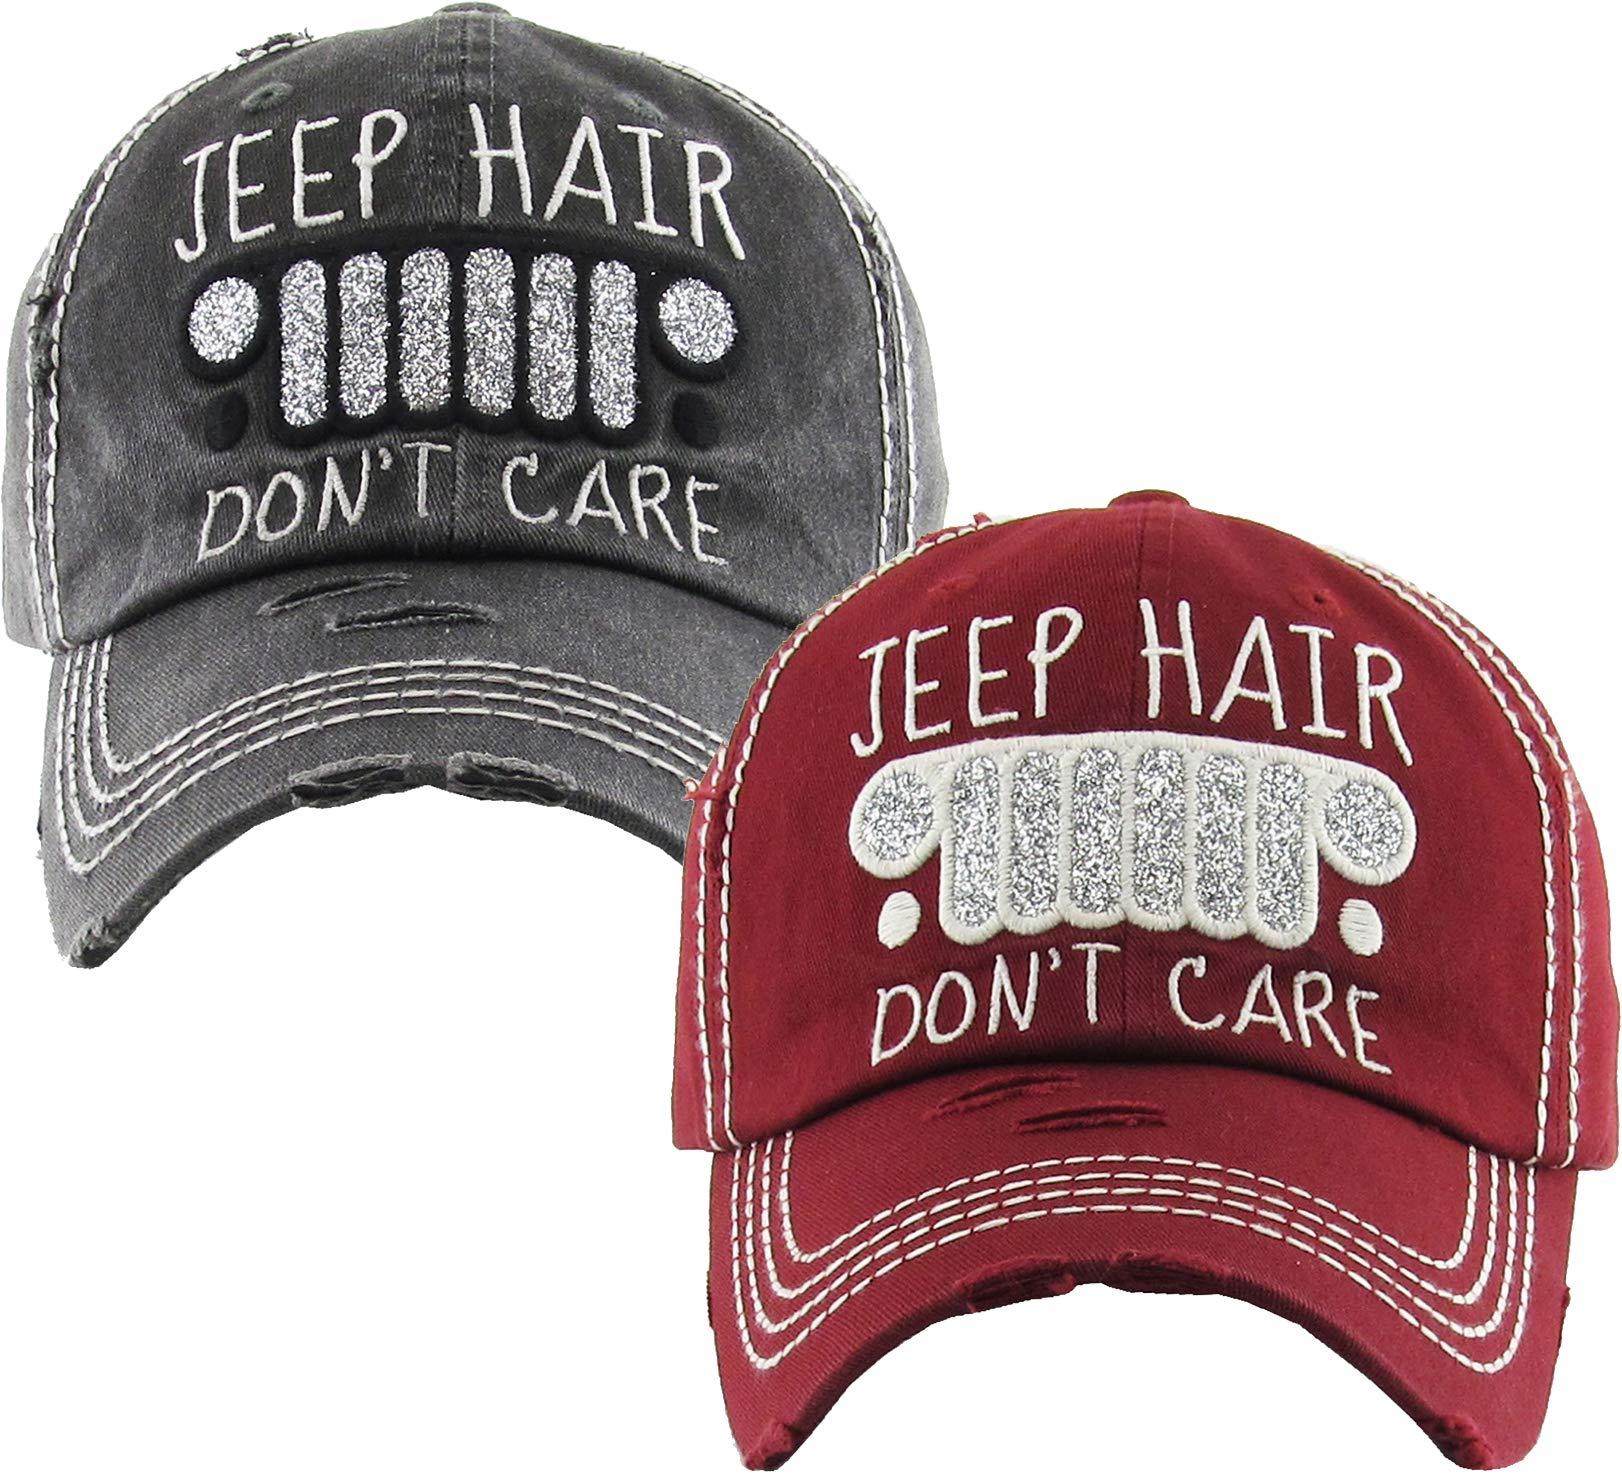 HB-212-2-JHDC0664 Baseball Cap Bundle - Jeep Hair Don't Care - Black & Burgundy